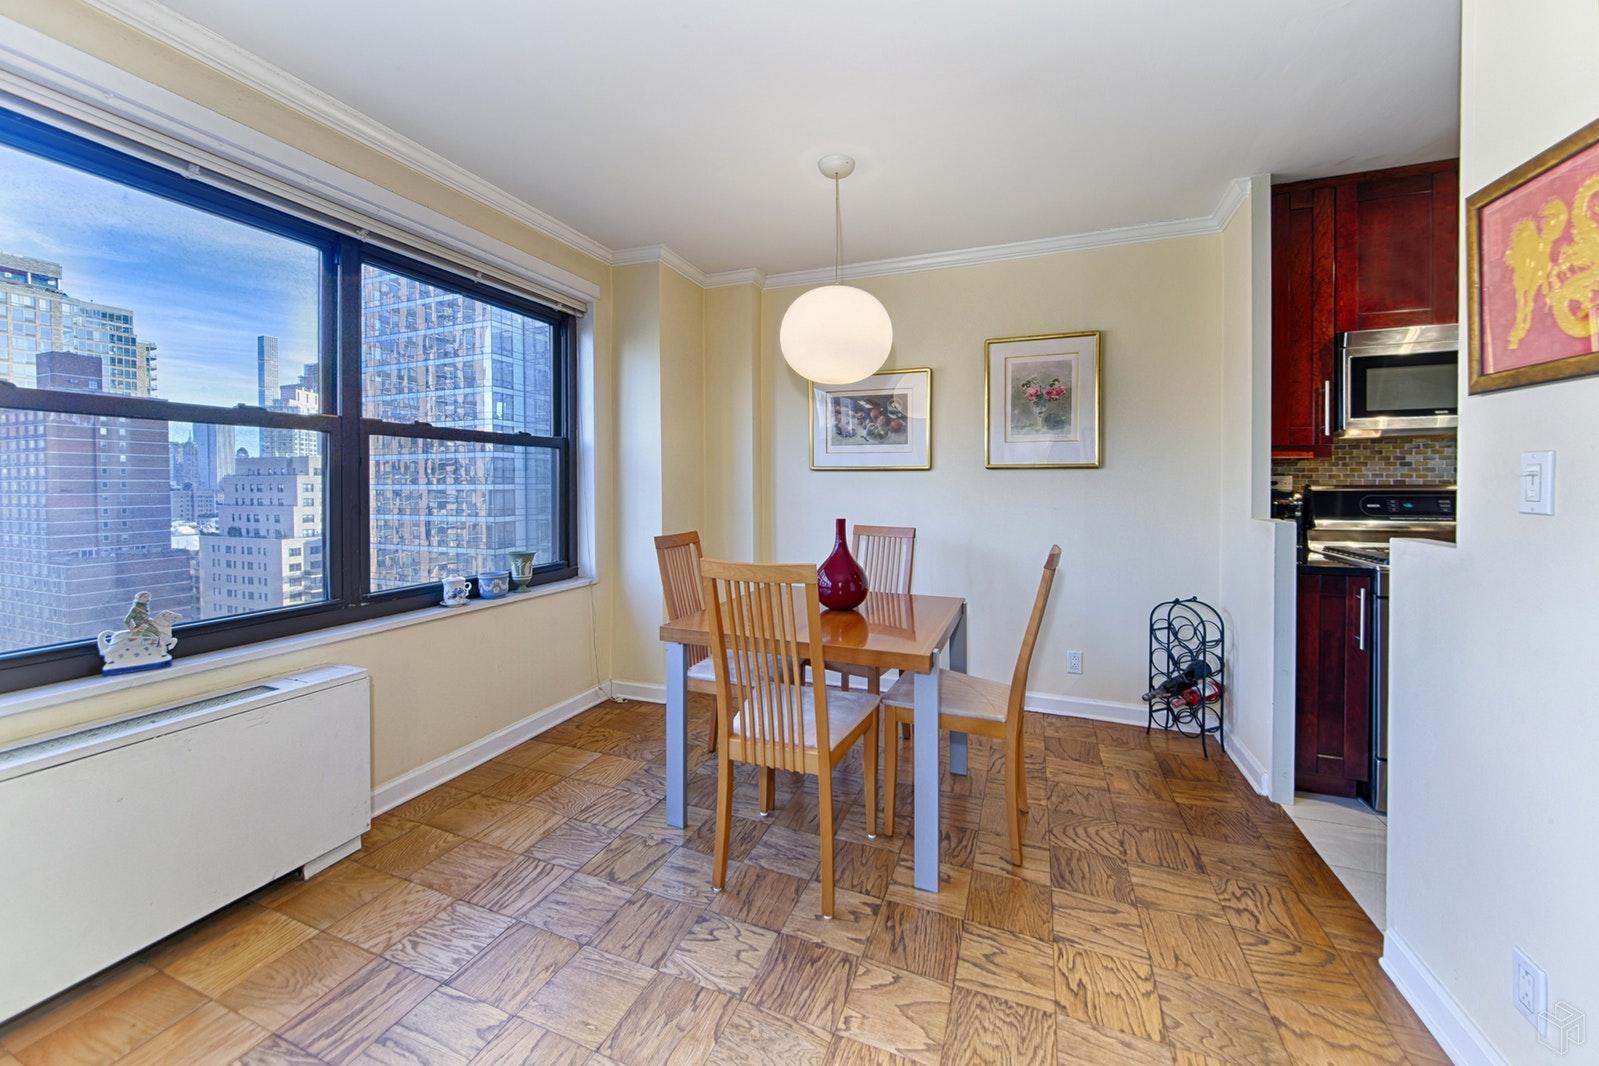 160 WEST END AVENUE 21T, Upper West Side, $880,000, Web #: 19414282